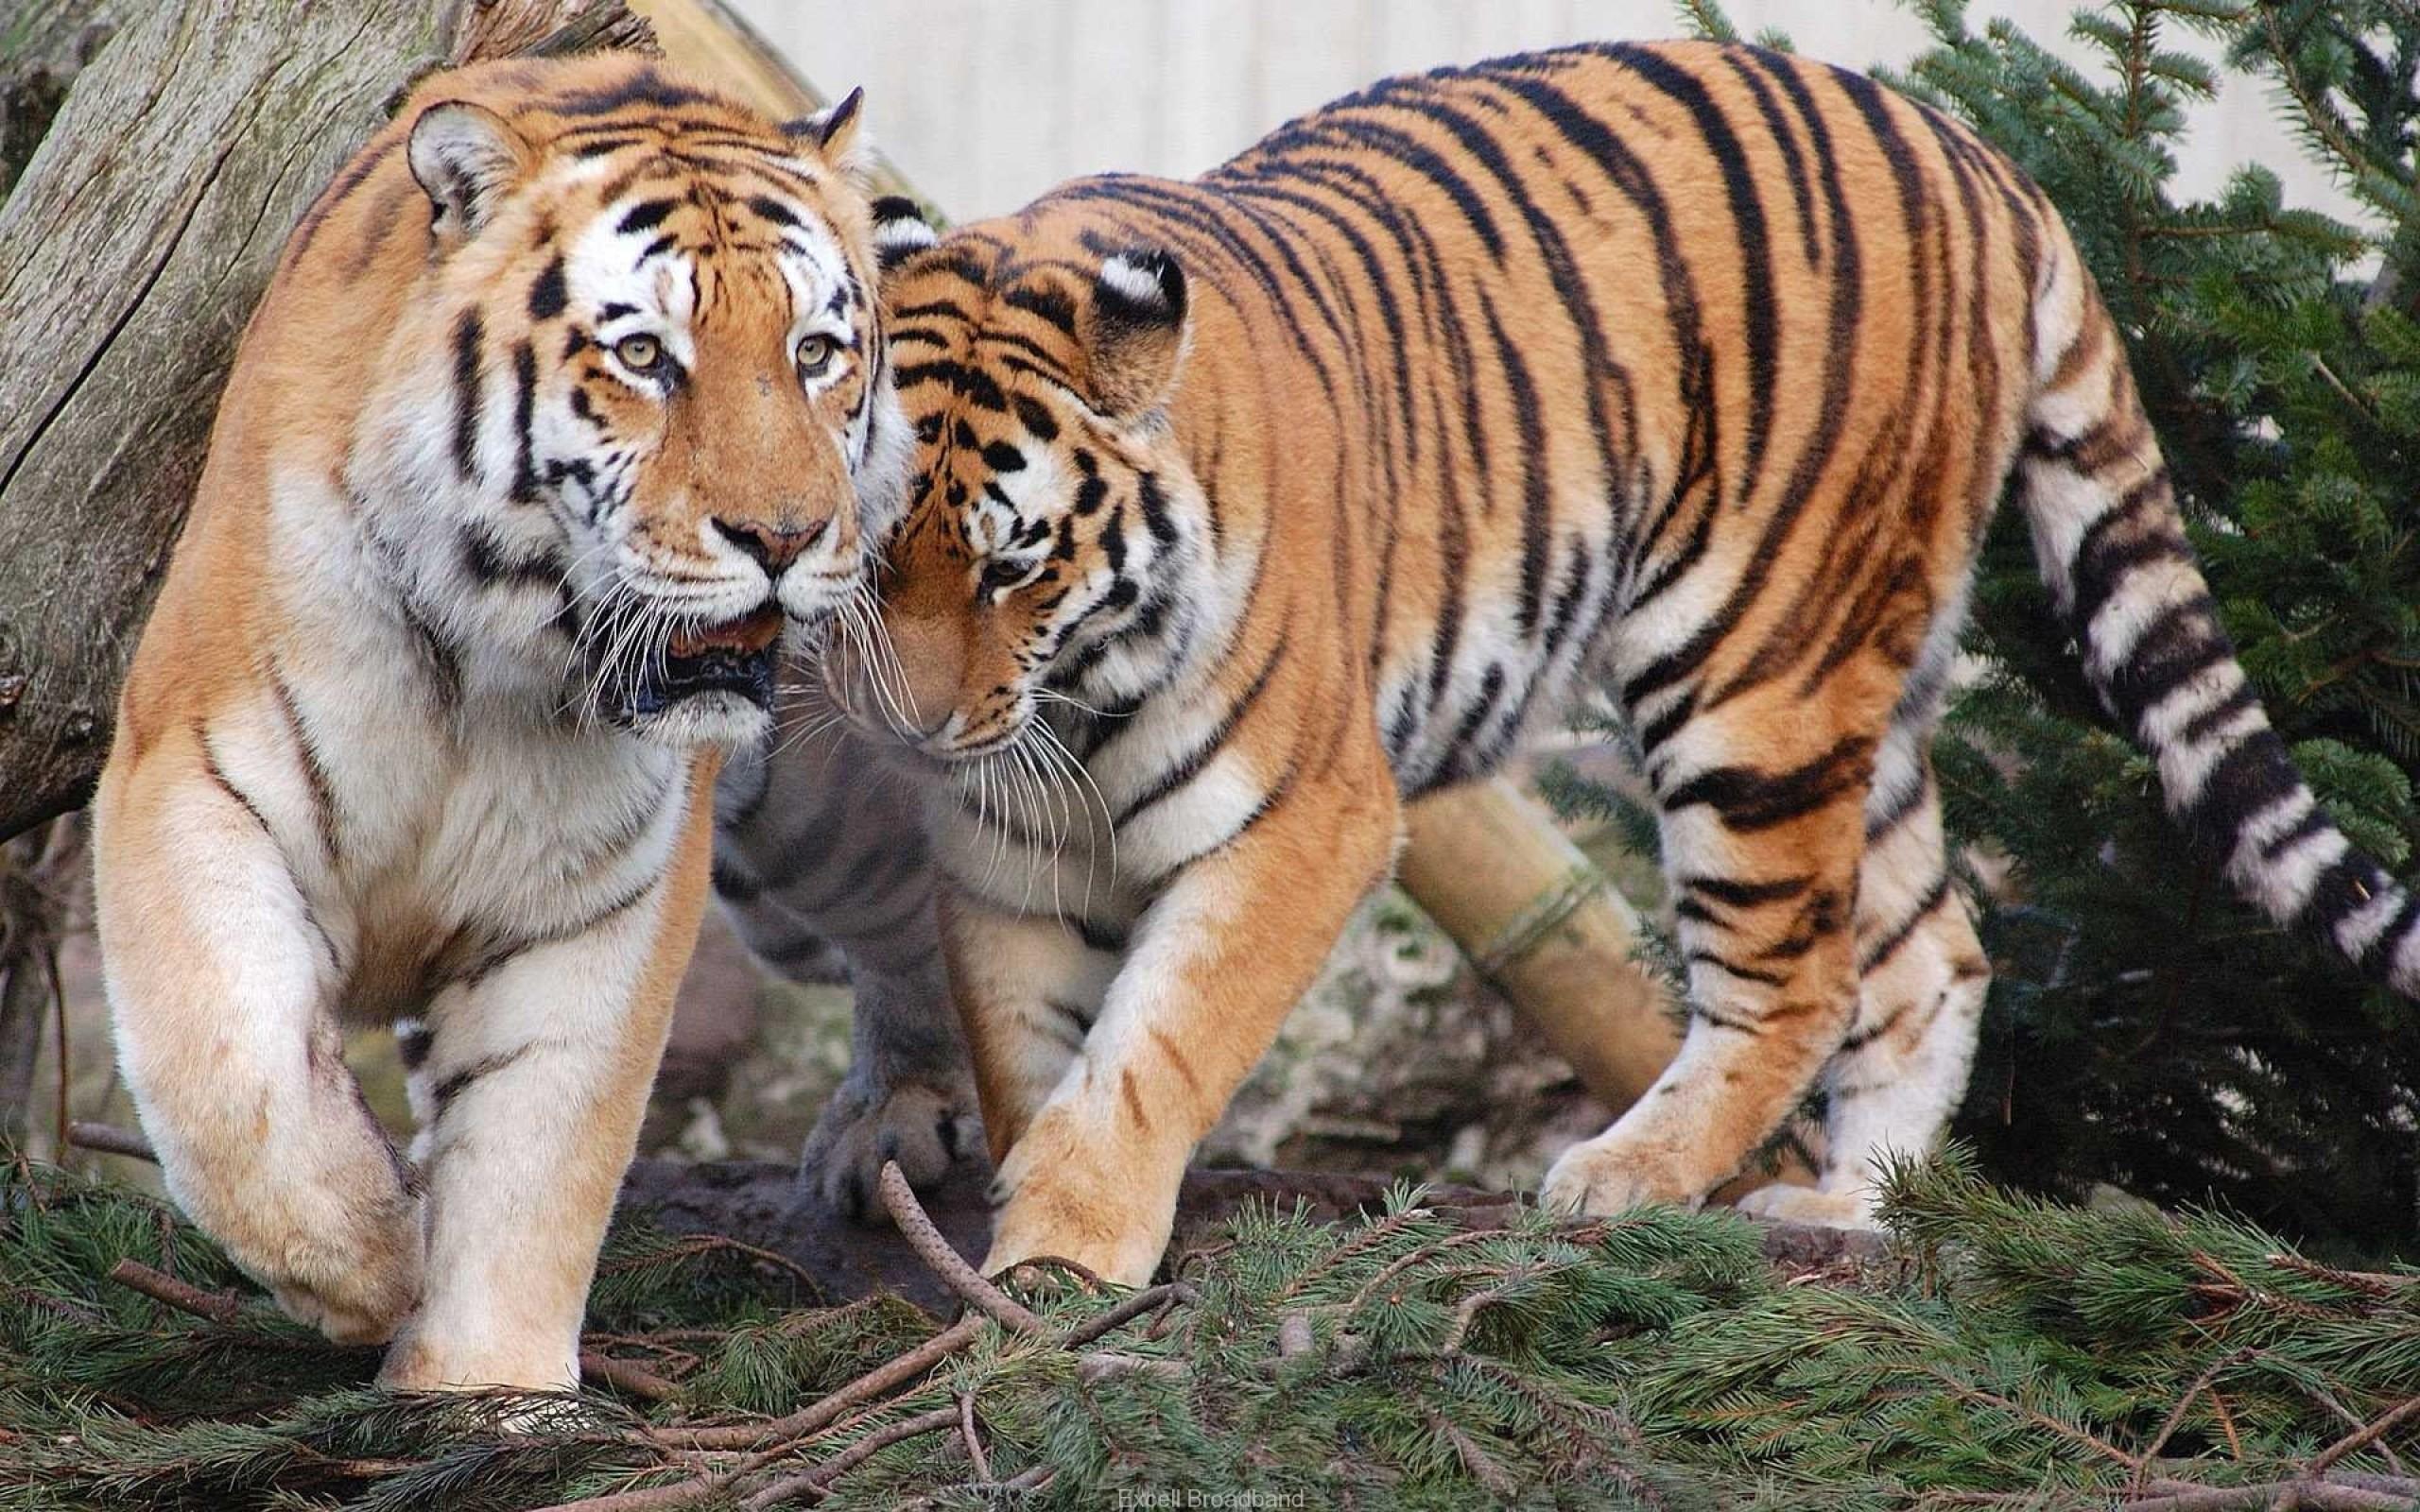 Tiger HD Wallpapers Download Desktop Wallpaper Images 2560x1600